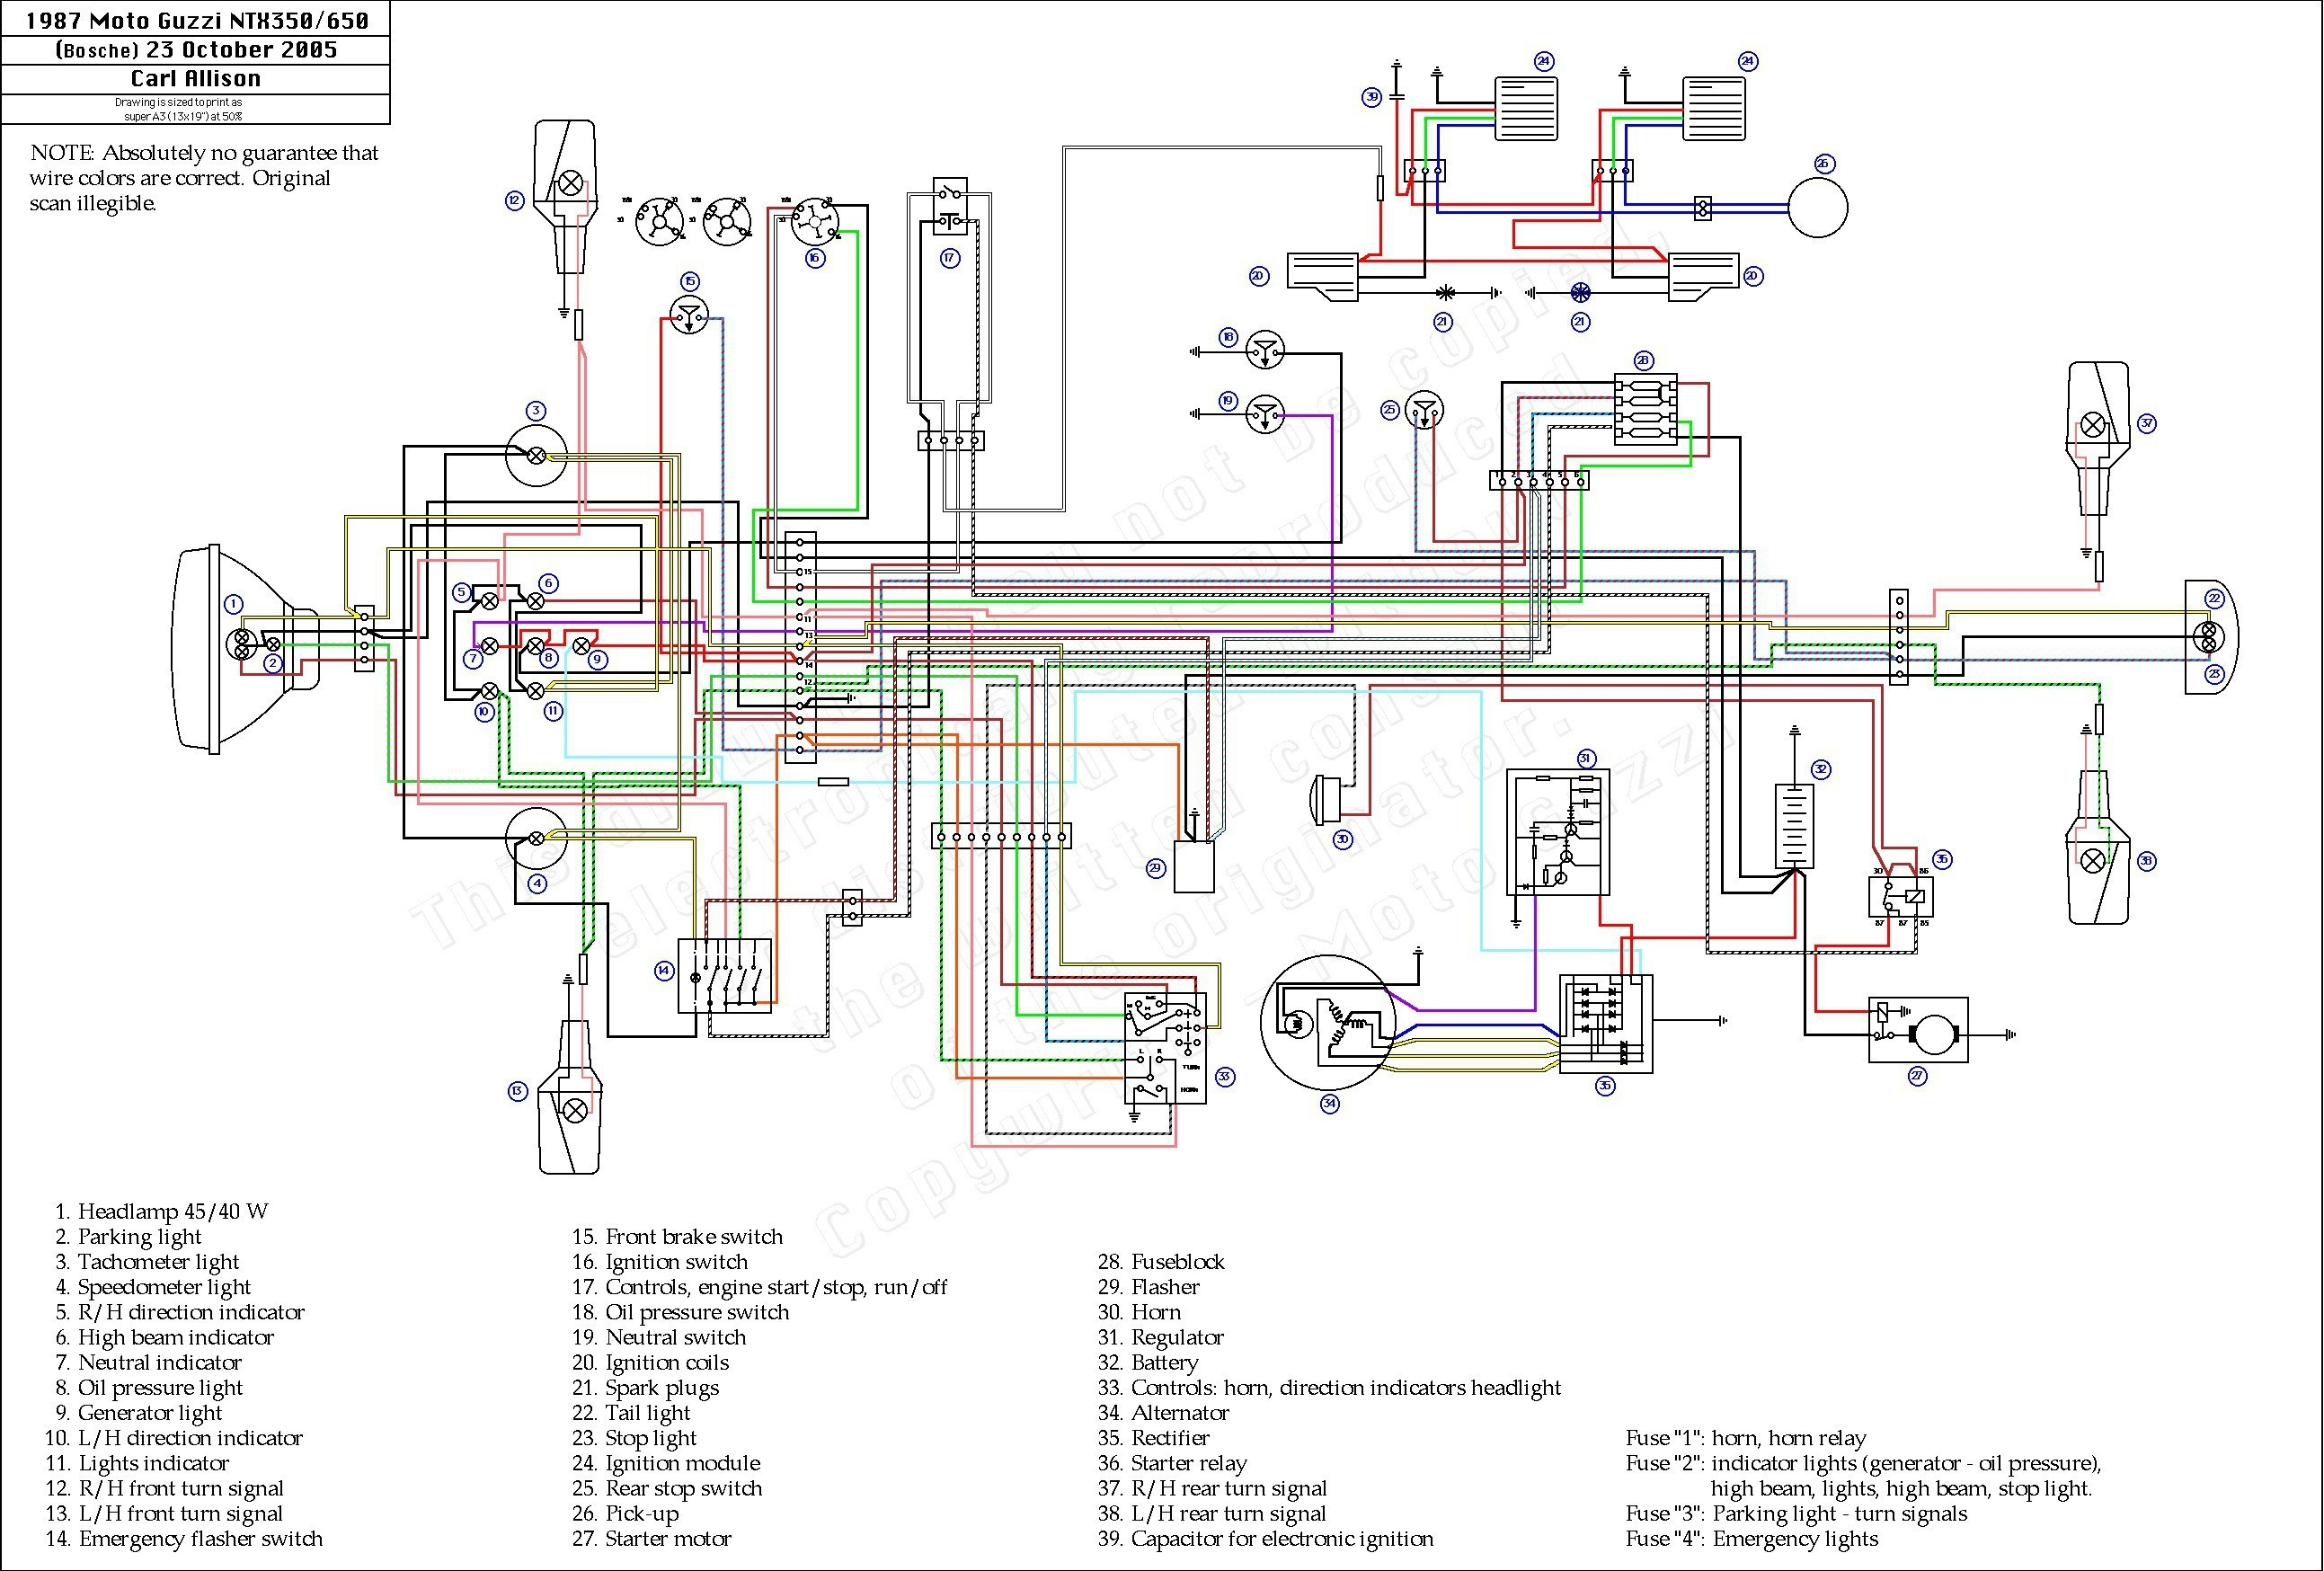 Zongshen Quad Wiring Diagram Along With Loncin Atv Wiring Diagram As